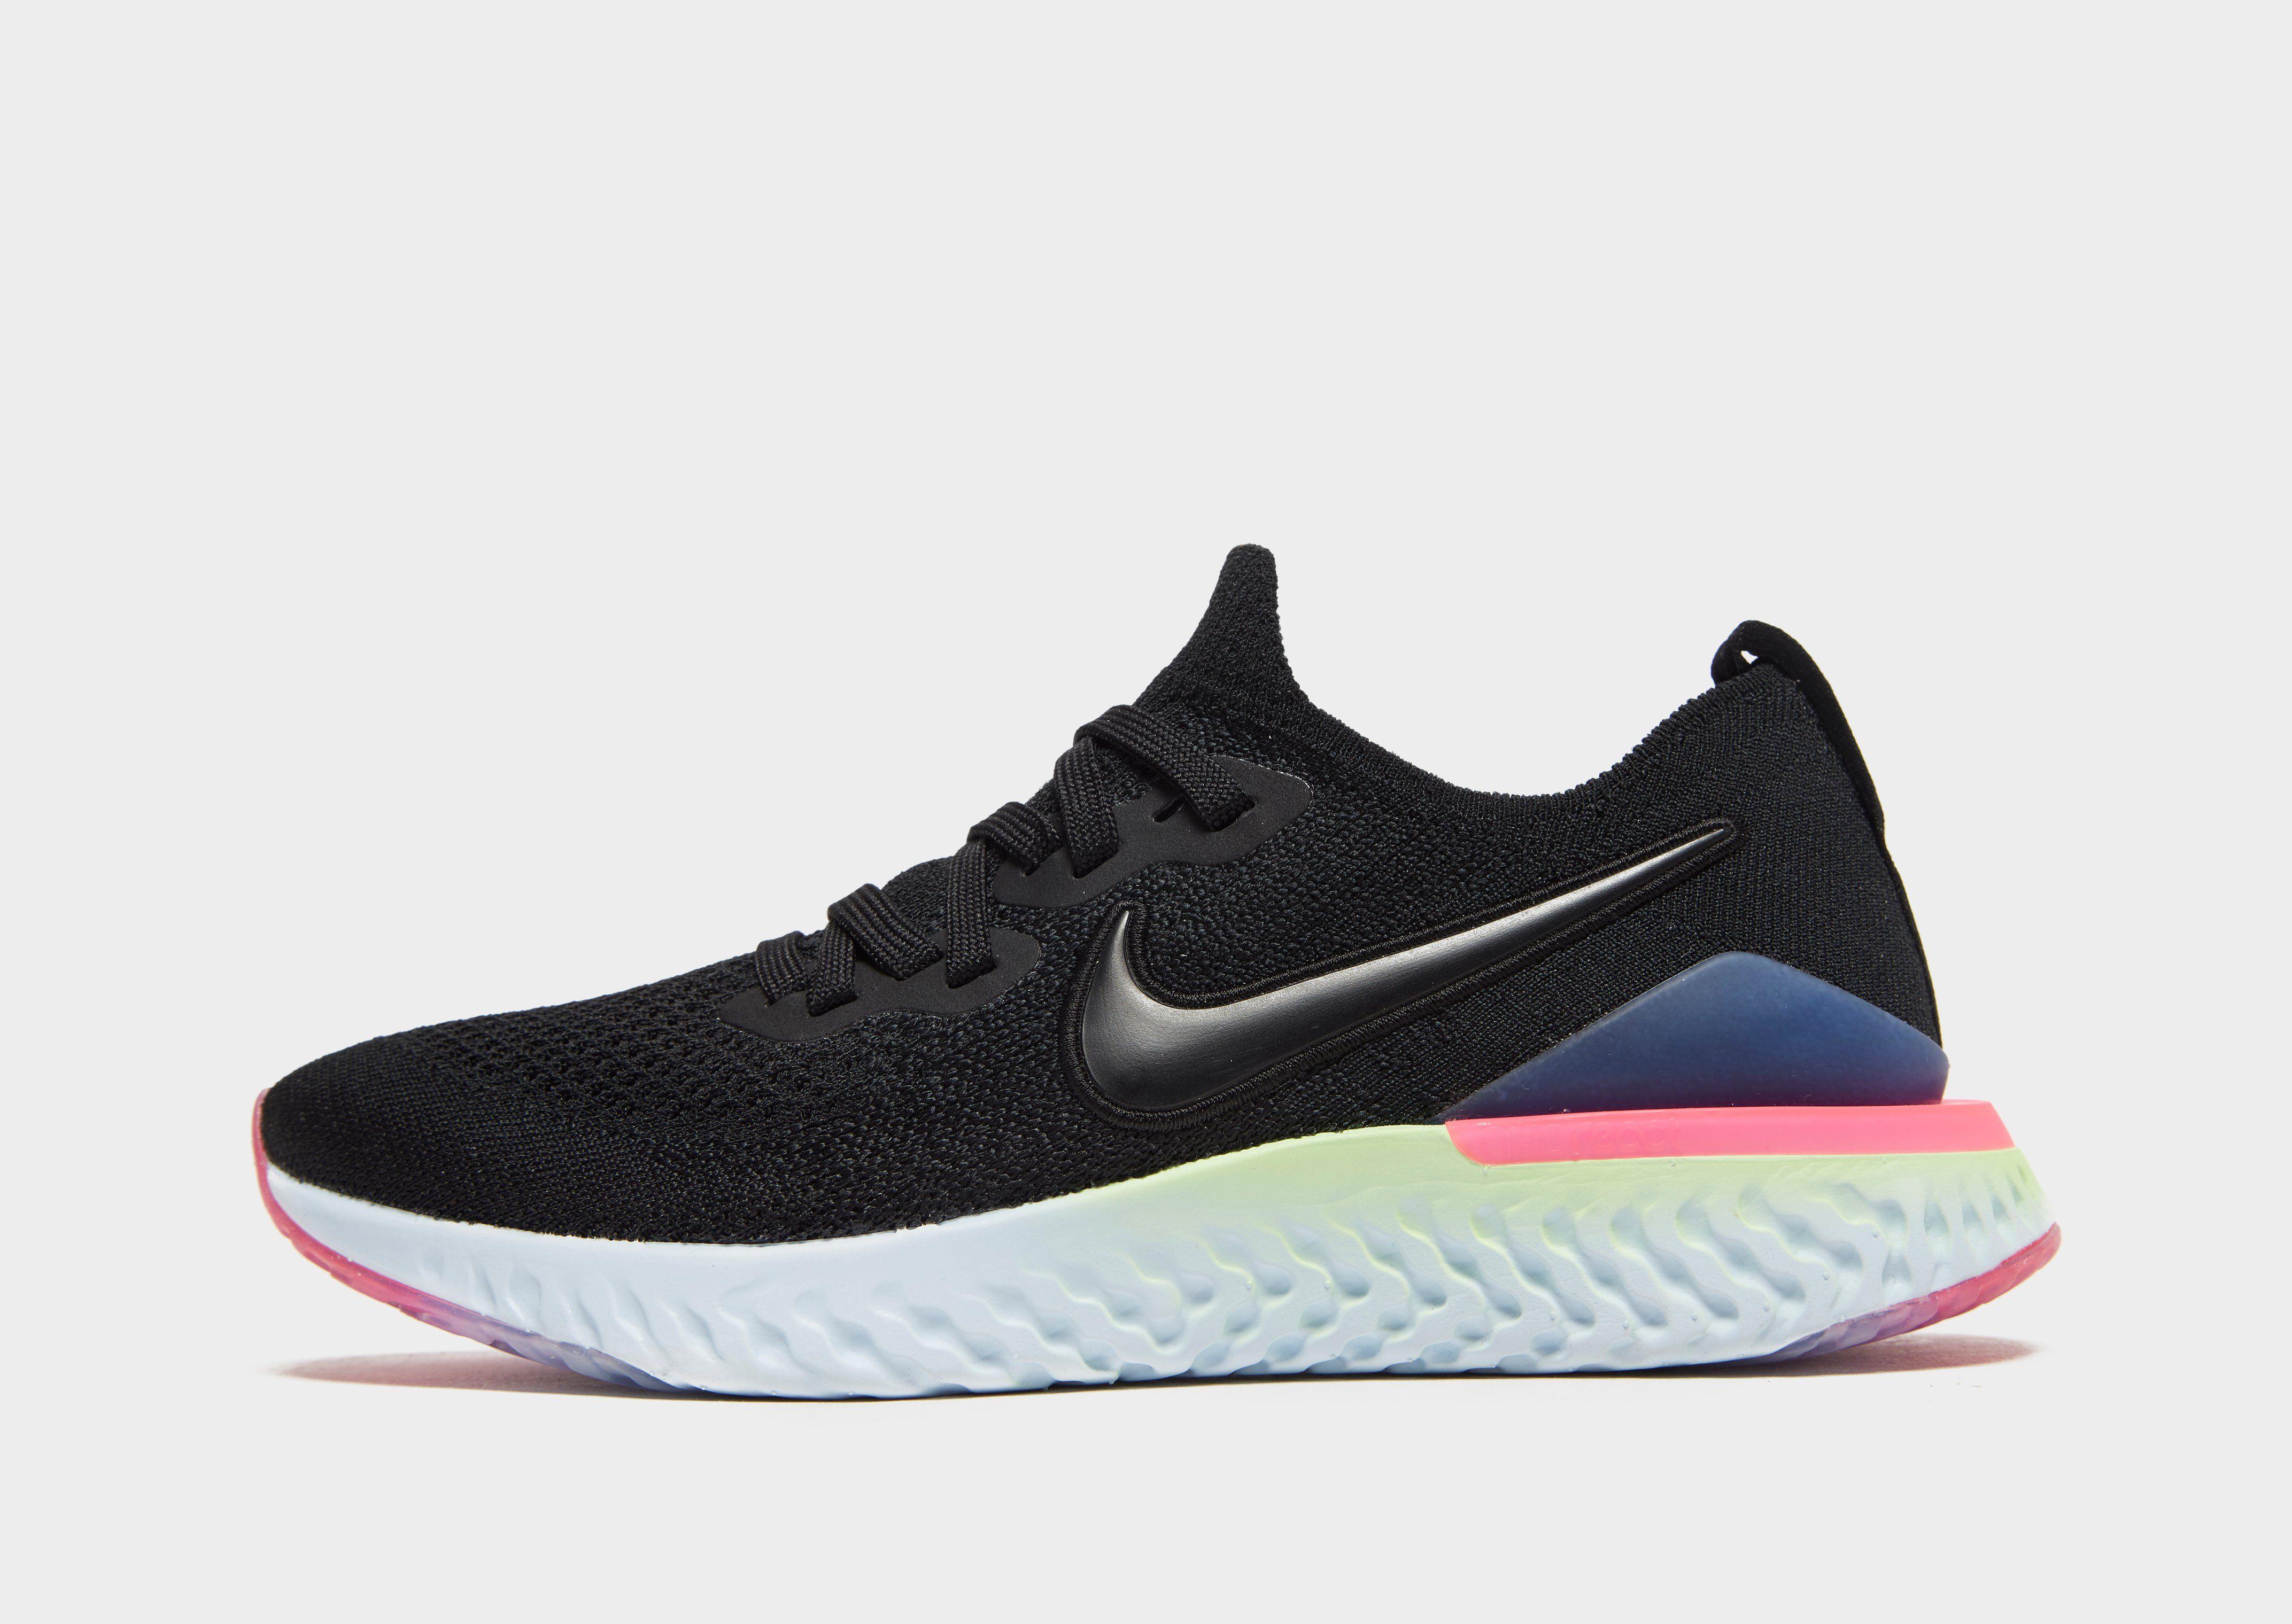 32f0ebdc553 Nike Epic React Flyknit 2 Junior